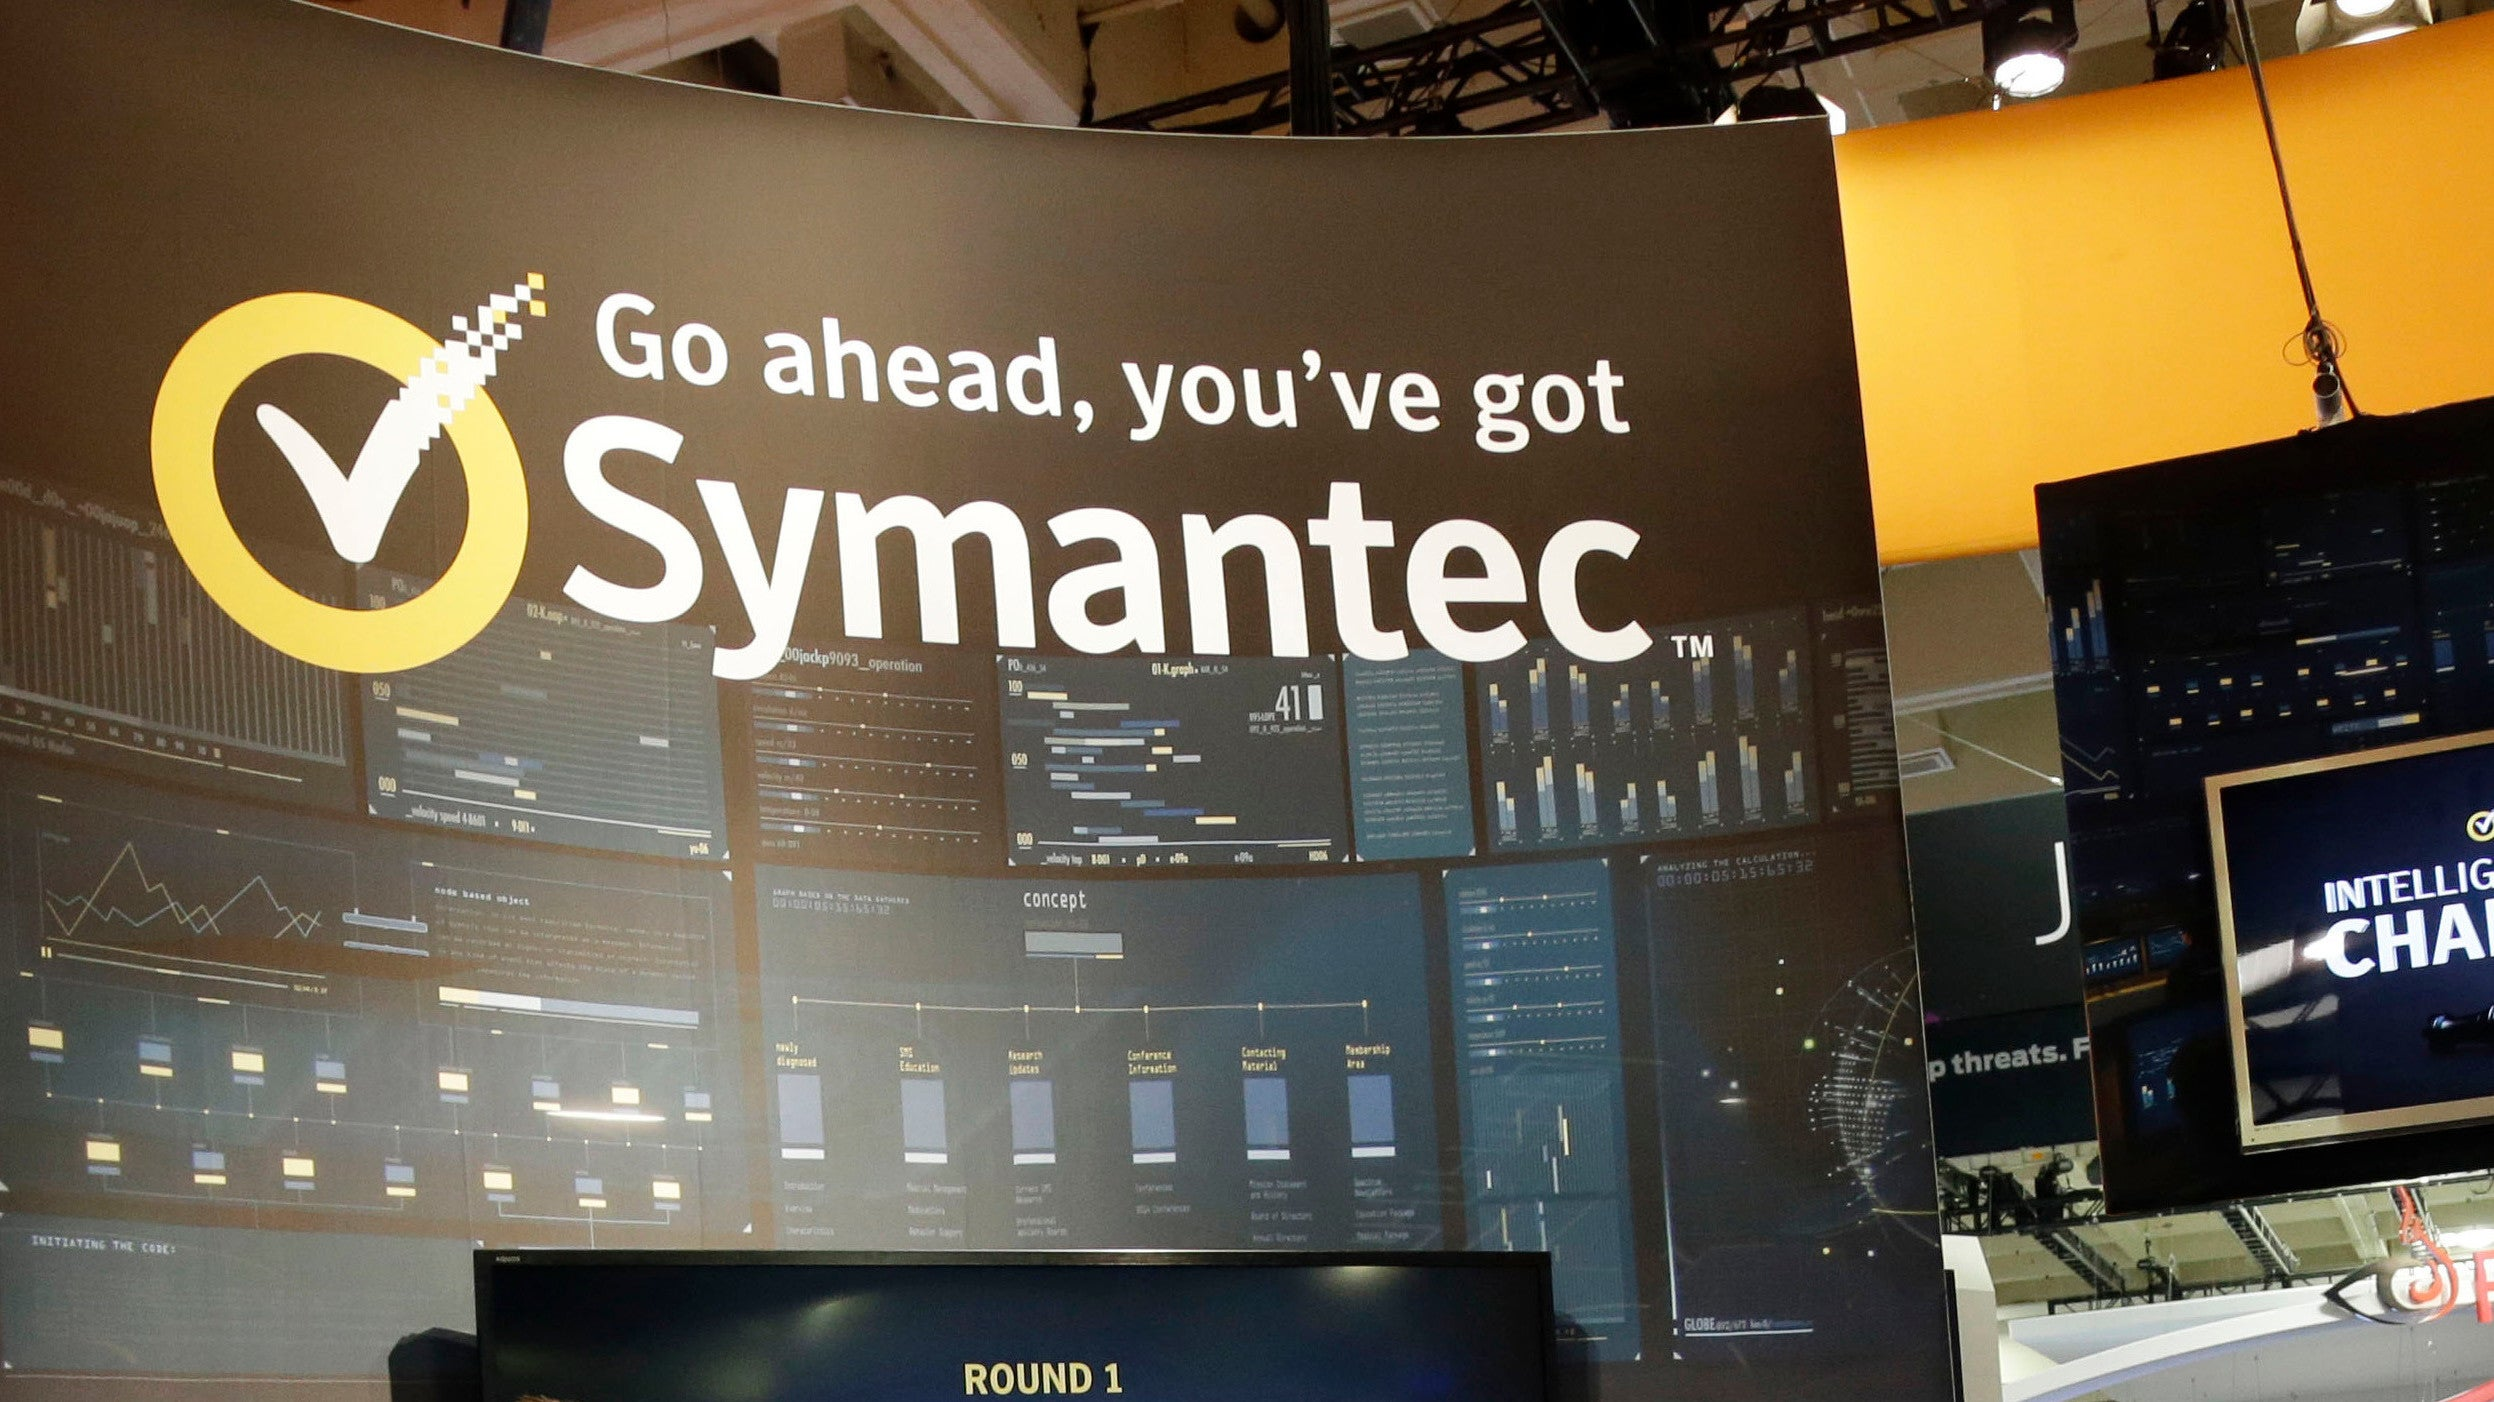 Symantec Data Stolen By Hacker Was Fake, Company Says